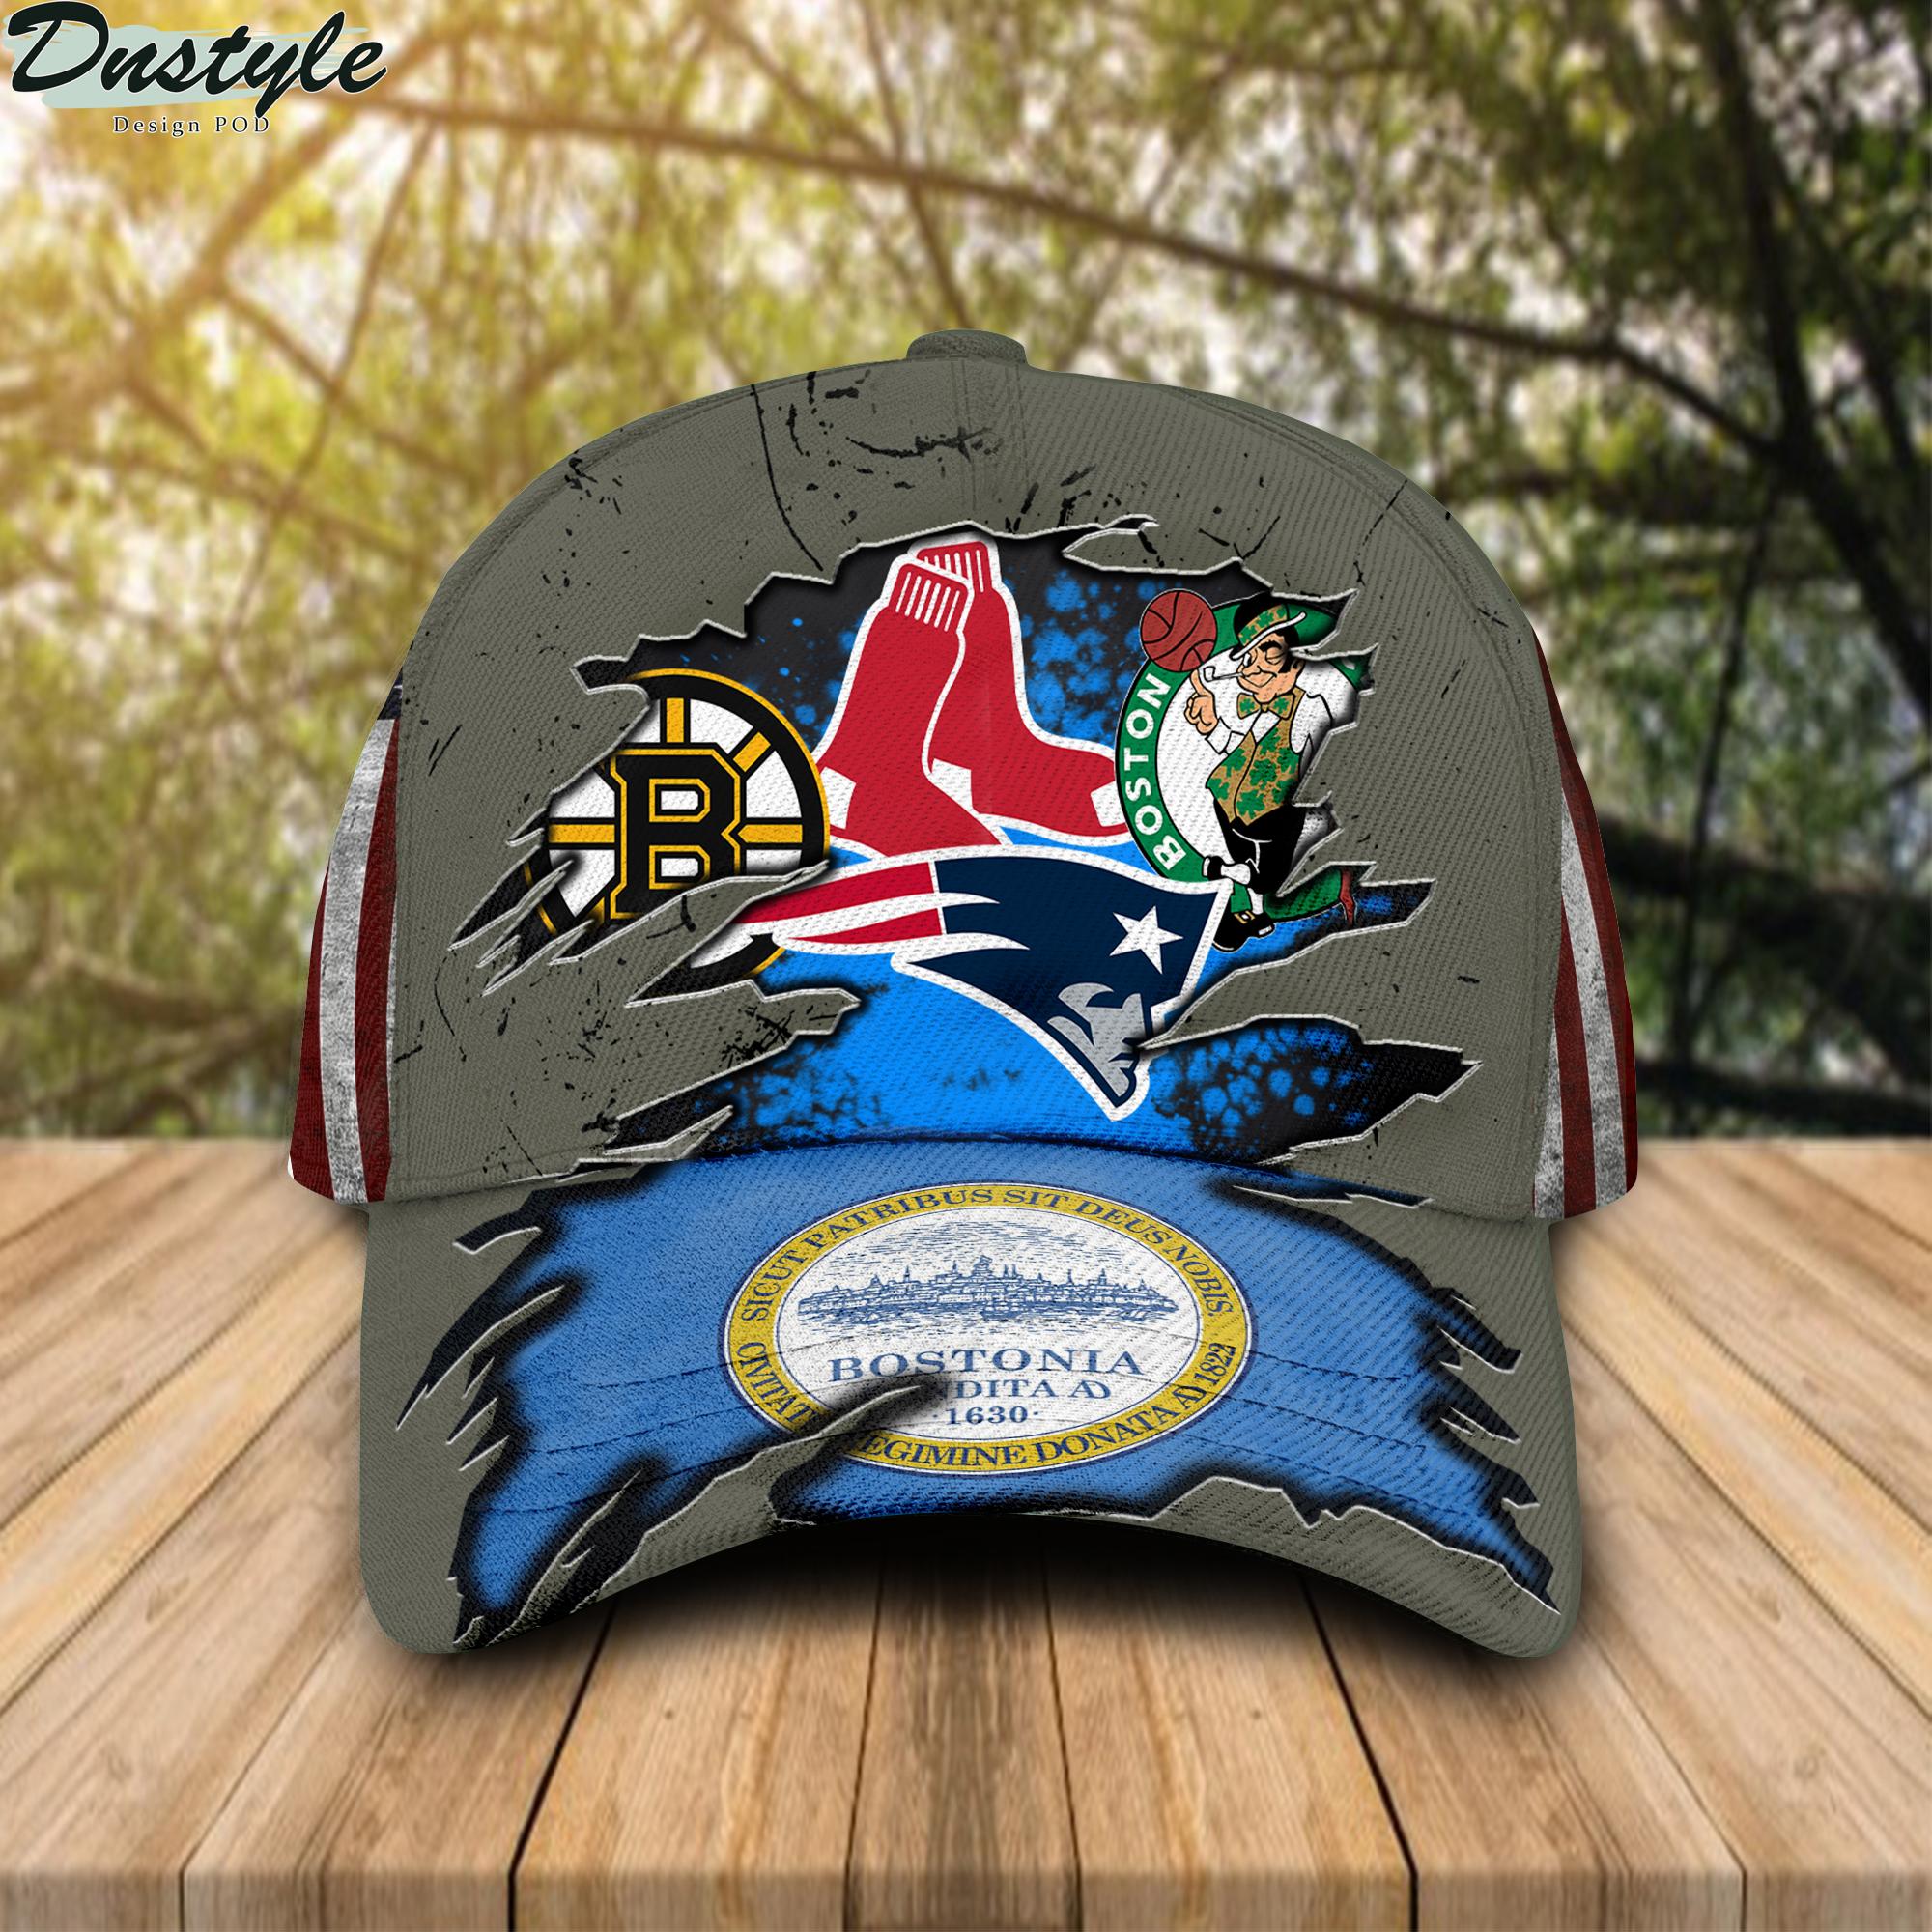 Bostonia Boston Celtics New England Patriots Boston Bruins Boston Red Sox Cap